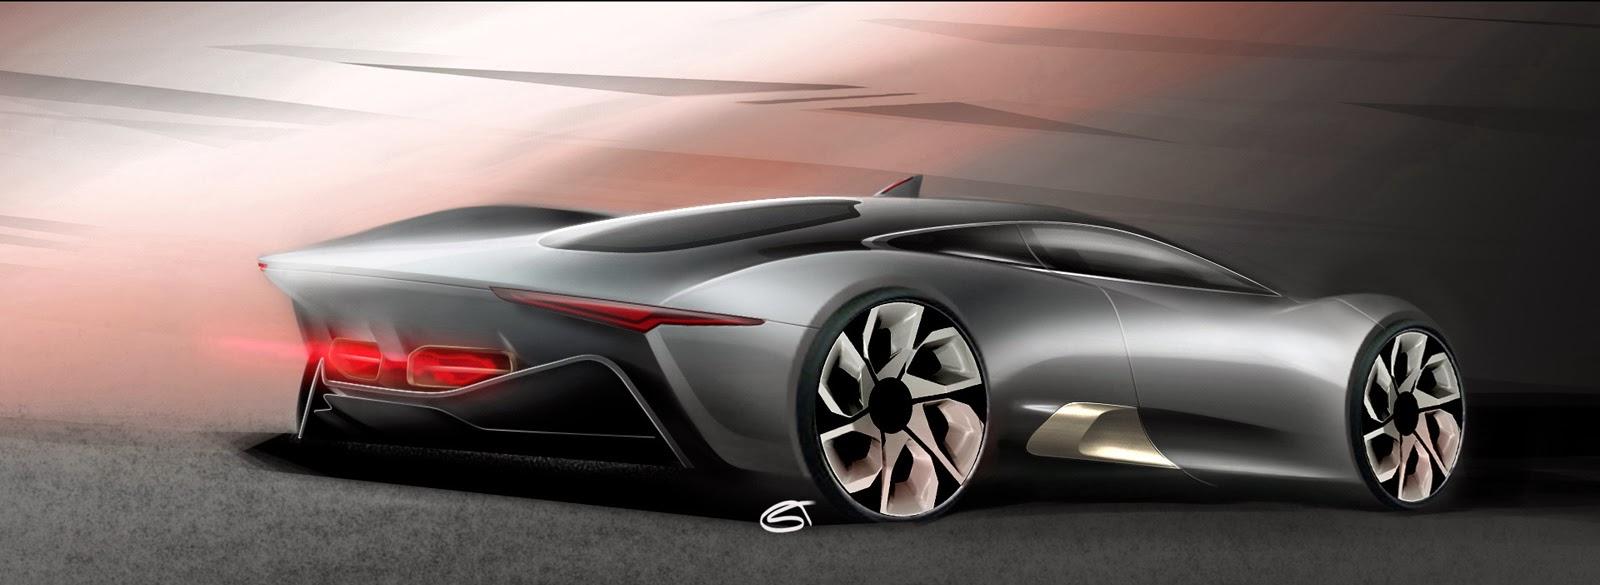 Jaguar Concept Cars Hd Wallpaper And Photos